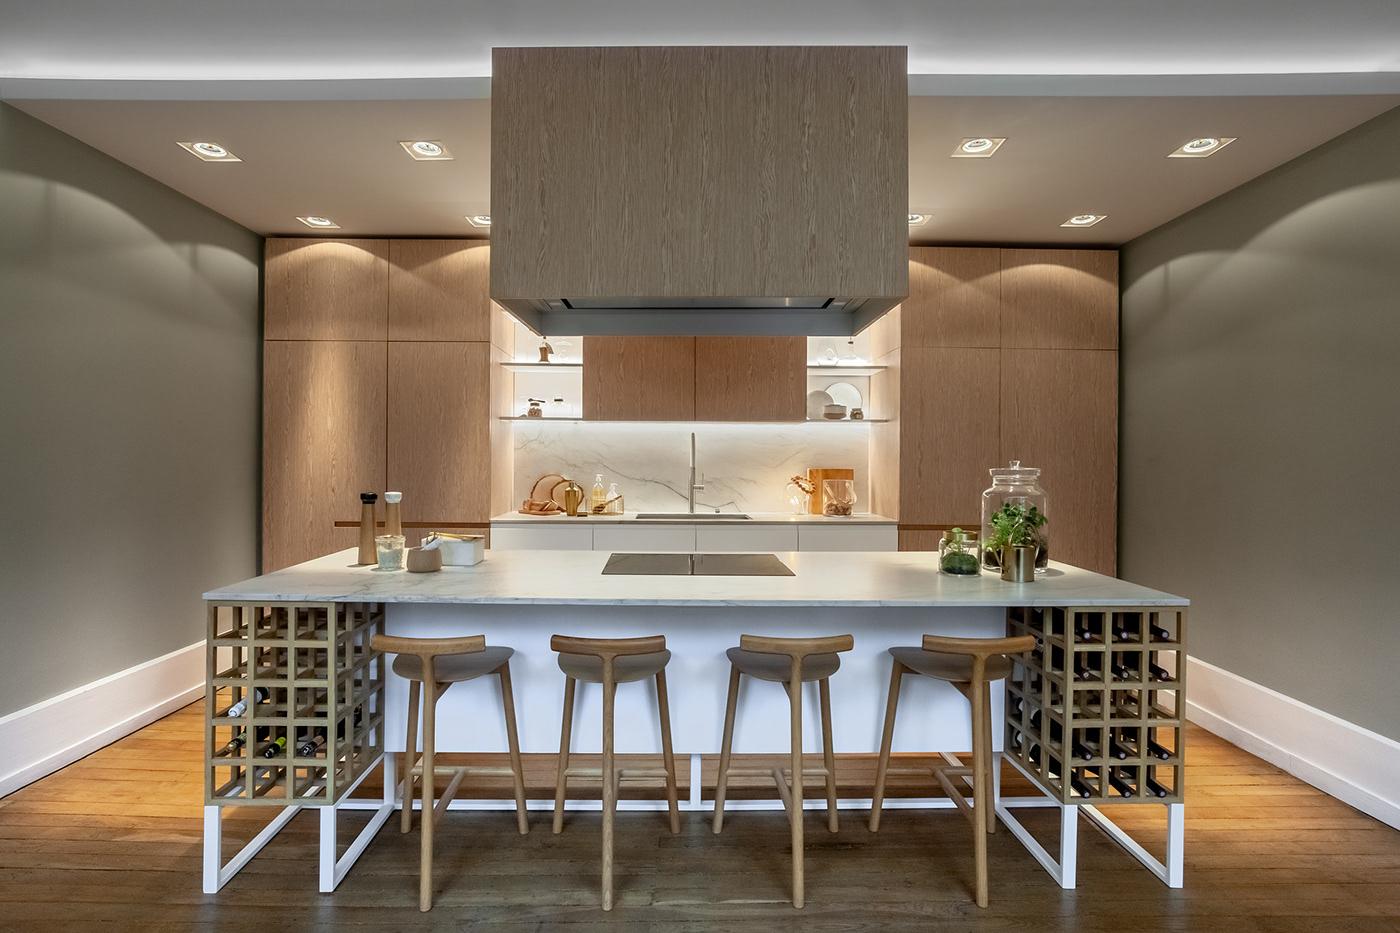 interior design  homedesign homedecor renovation kitchen bathroom design millwork quartzite